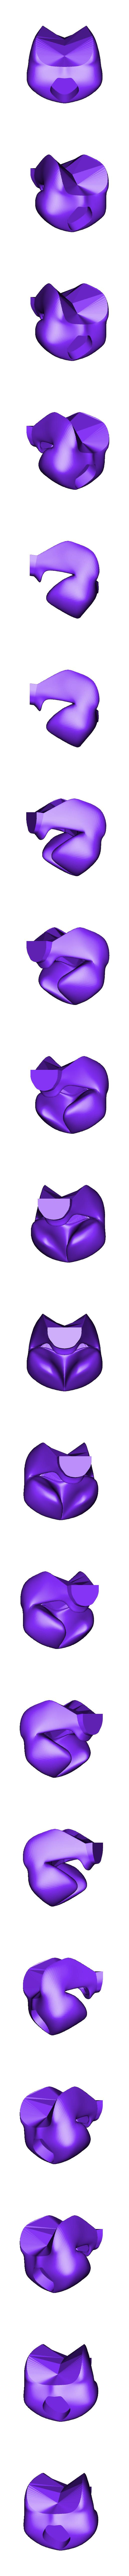 face_no_supports.stl Download free STL file Astro Jetson • 3D print model, reddadsteve